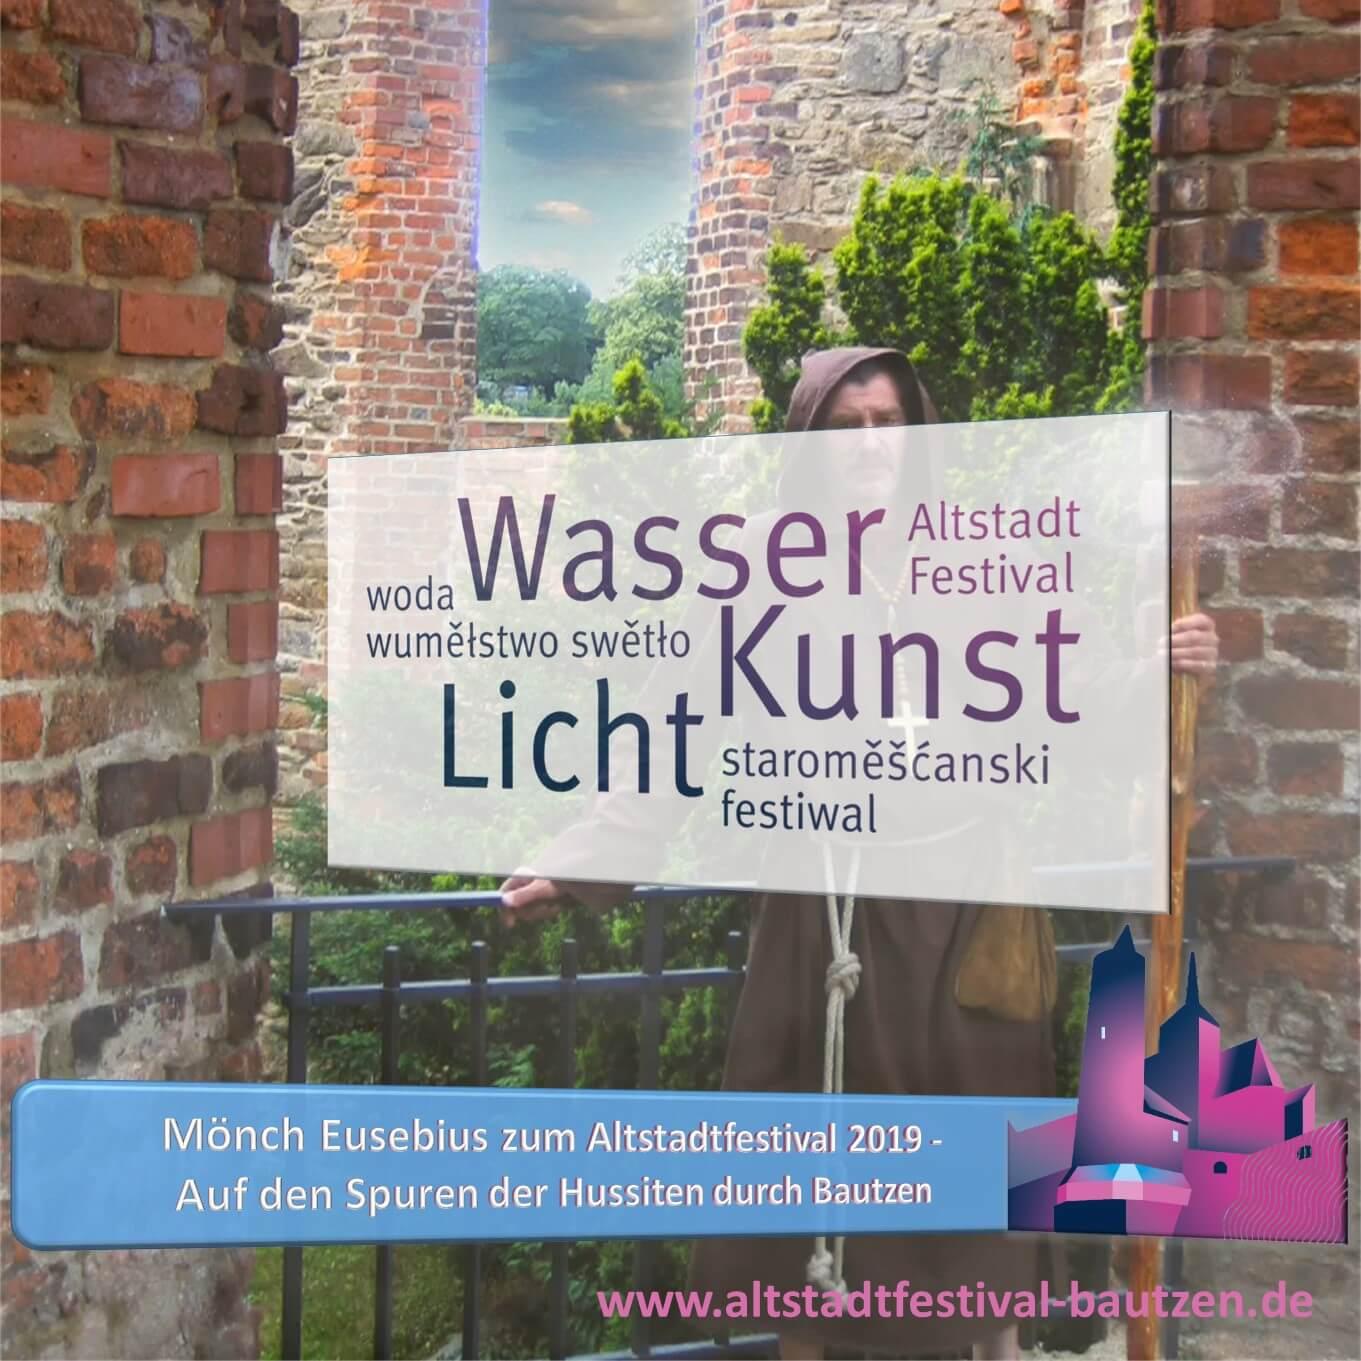 Beitrag Mönch Eusebius zum Altstadtfestival 2019